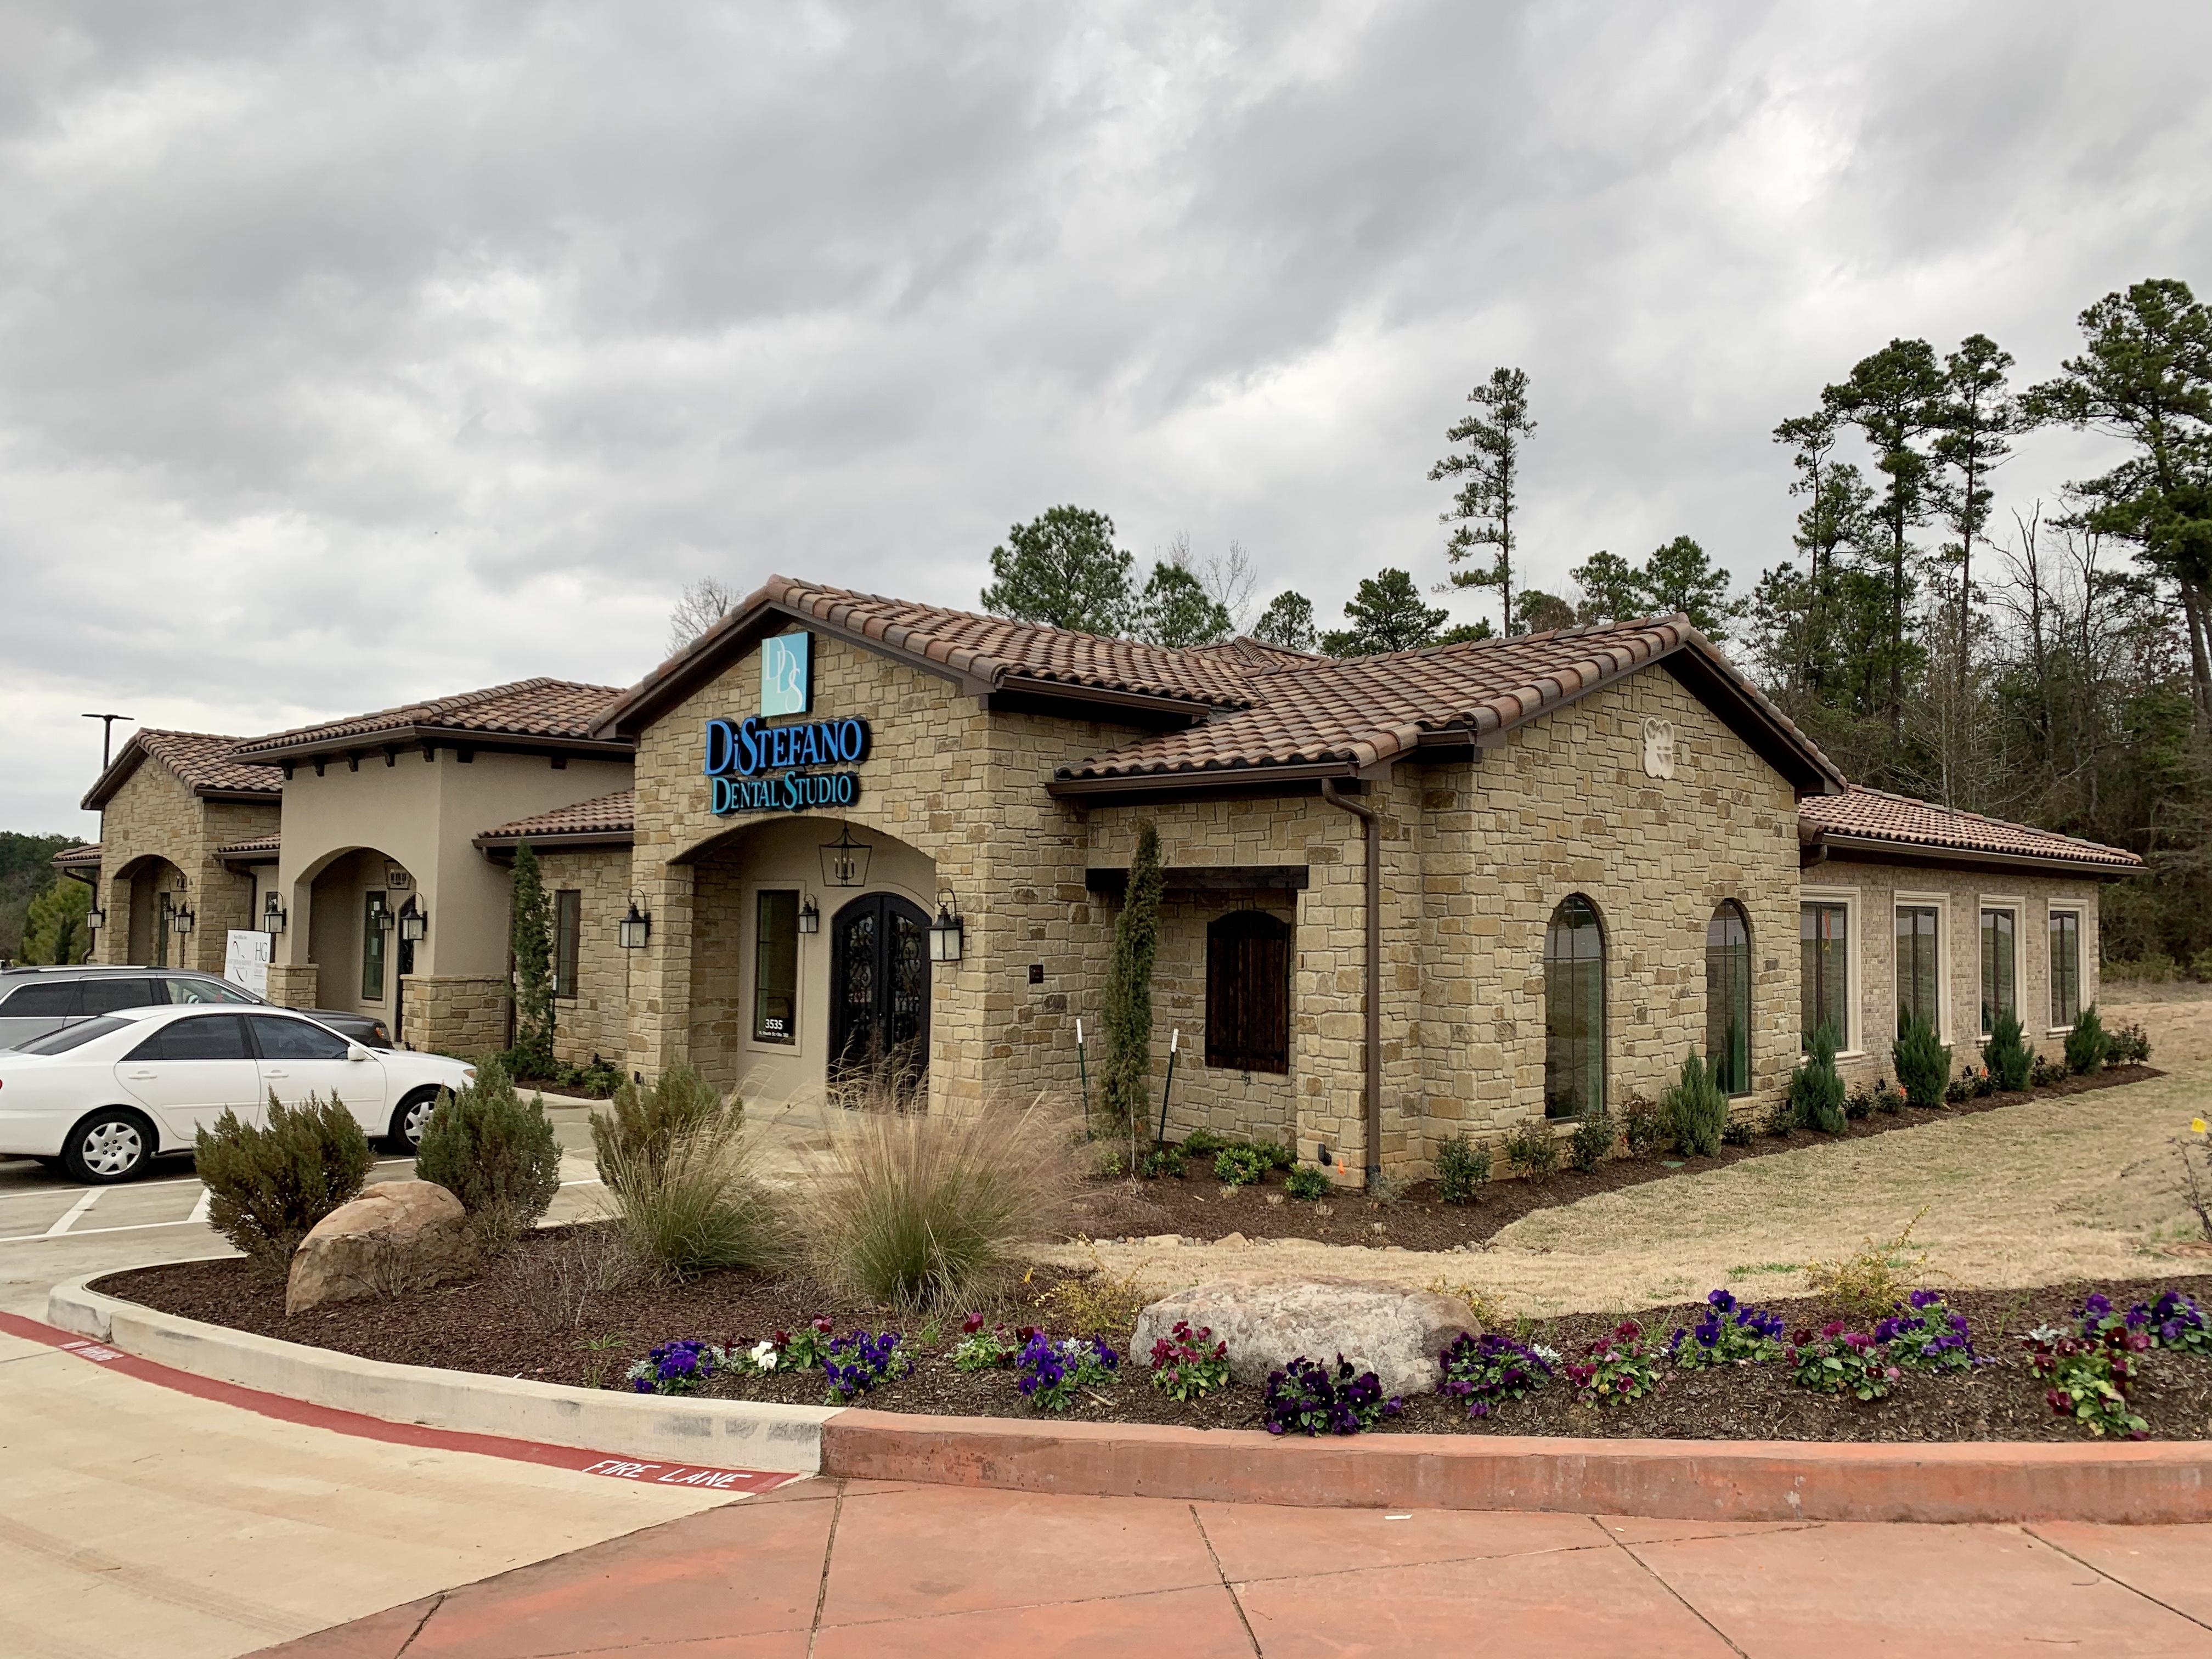 DiStefano Dental Studio reviews | Cosmetic Dentists at 3535 North Fourth Street - Longview TX